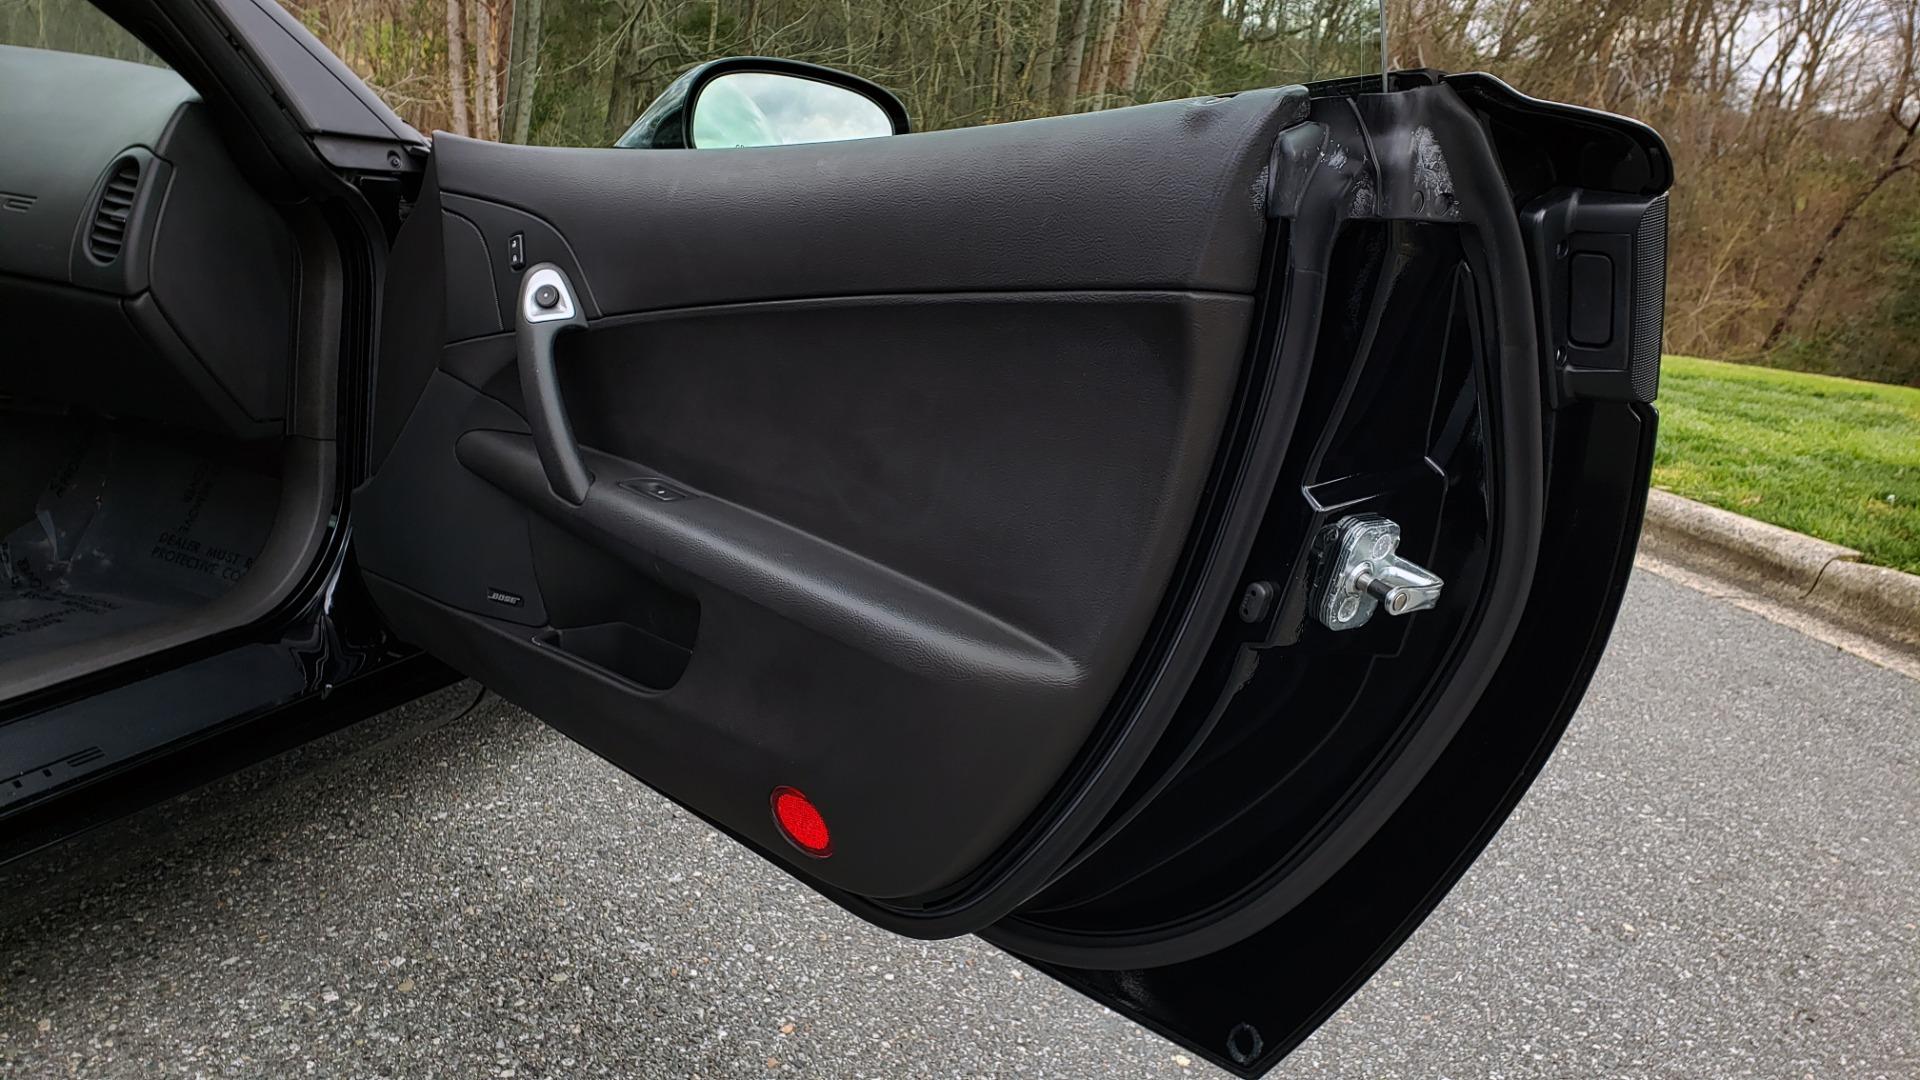 Used 2007 Chevrolet CORVETTE Z06 2LZ / 7.0L 427 V8 / 6-SPD MAN / BOSE / POLISHED WHEELS for sale Sold at Formula Imports in Charlotte NC 28227 80